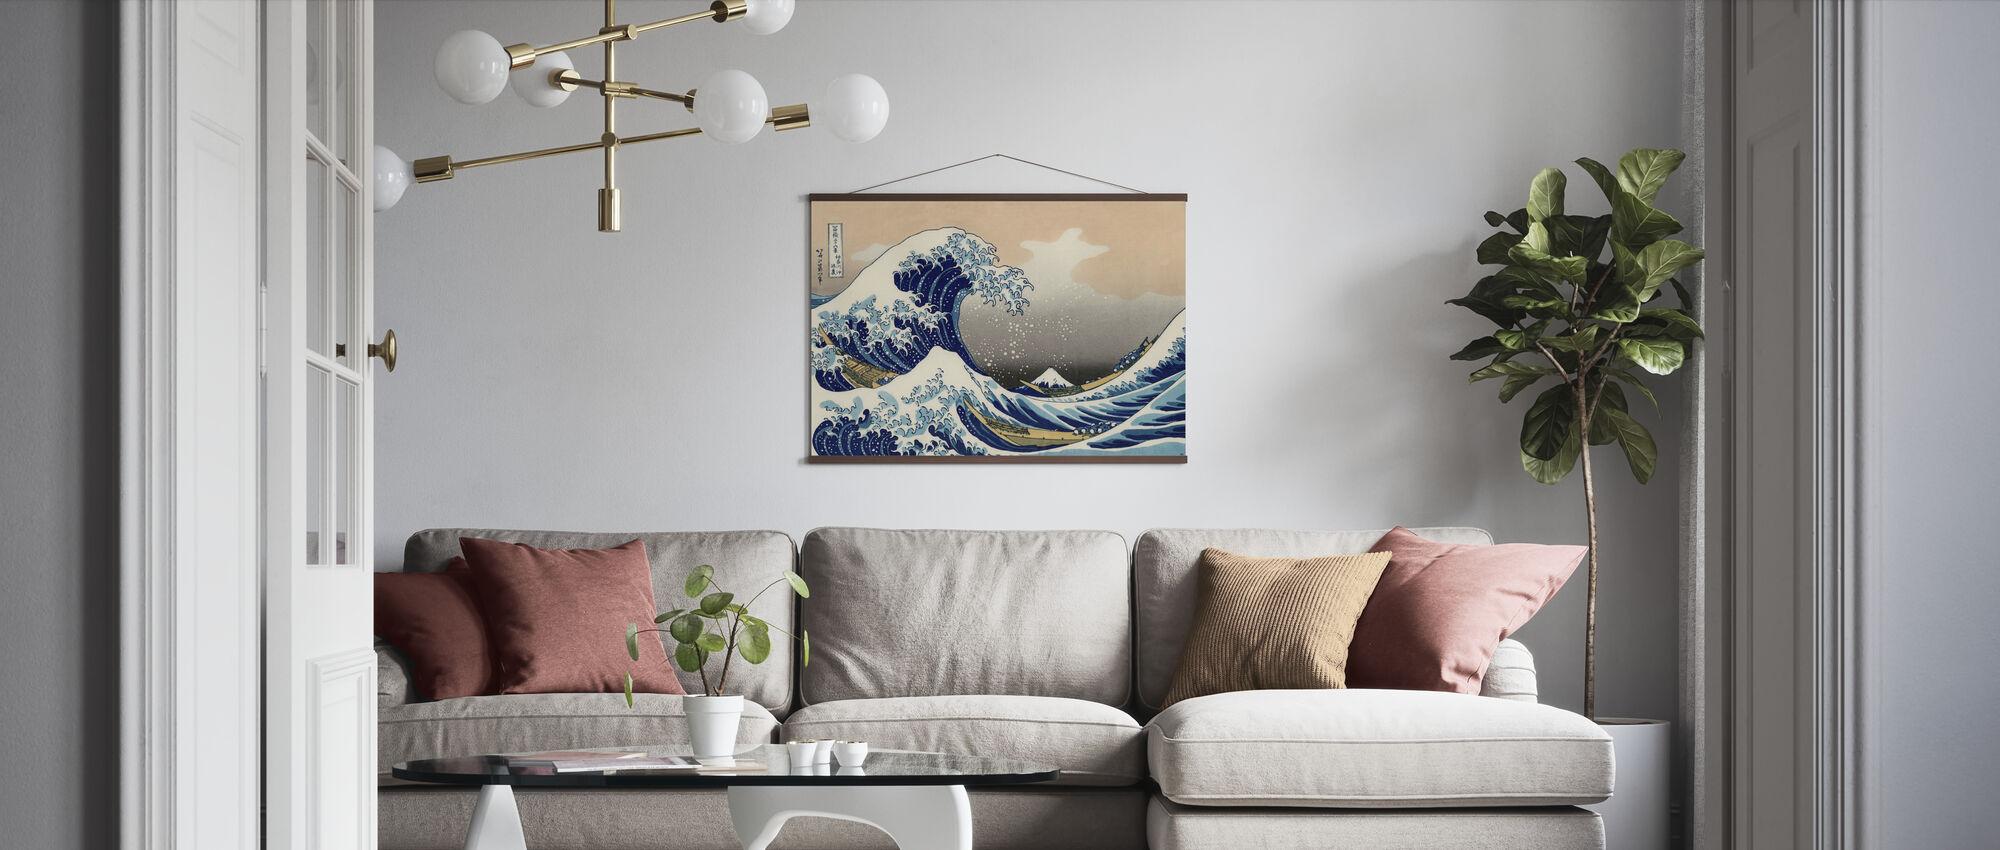 Great Wave, Katsushika Hokusai - Poster - Living Room